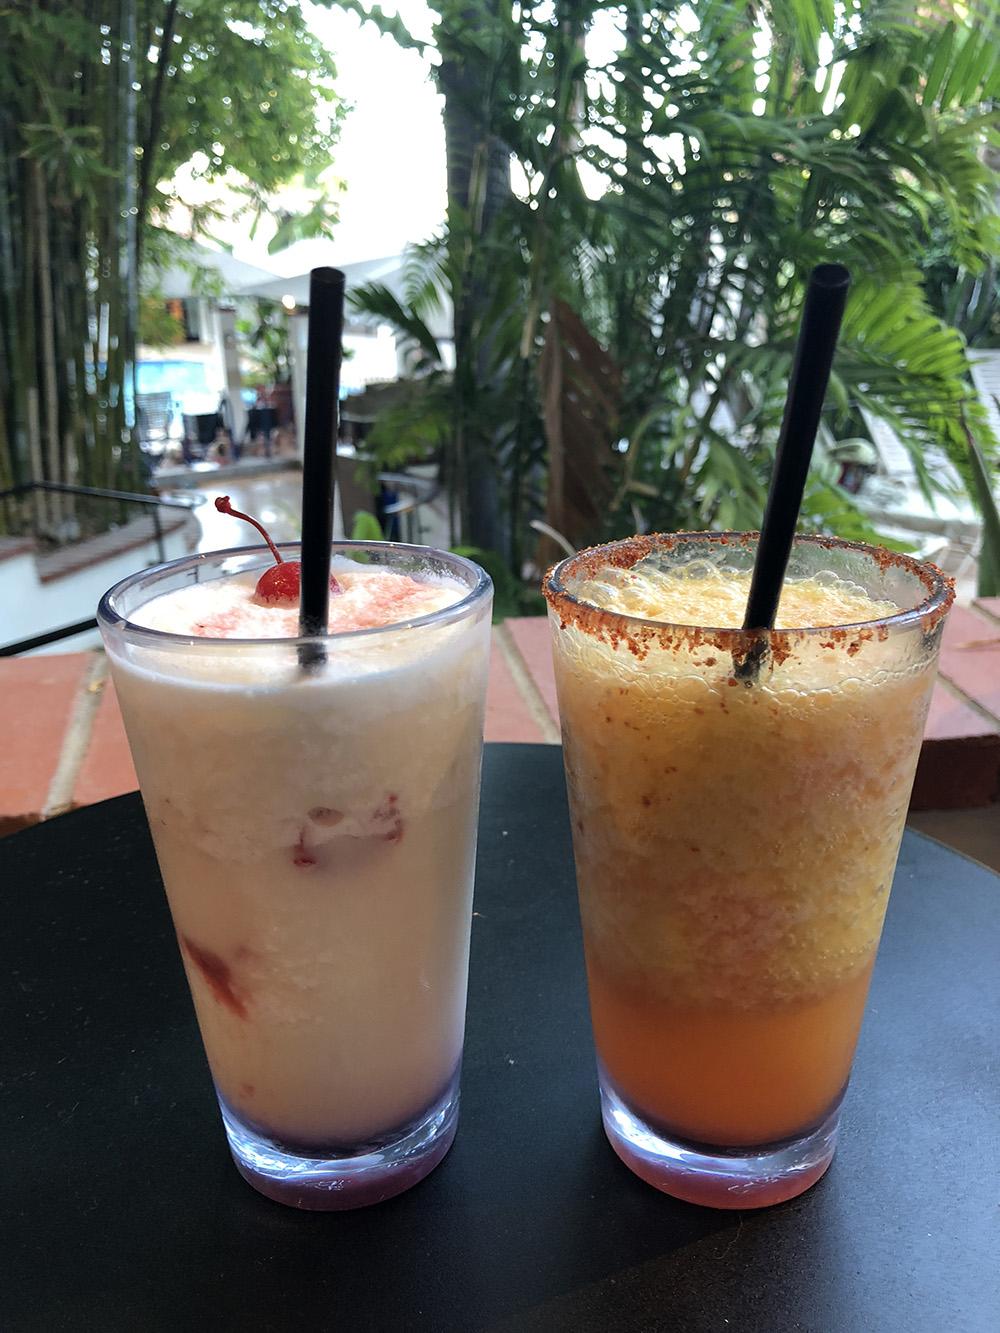 The Lava Flow and Mango Jalapeño Margarita.